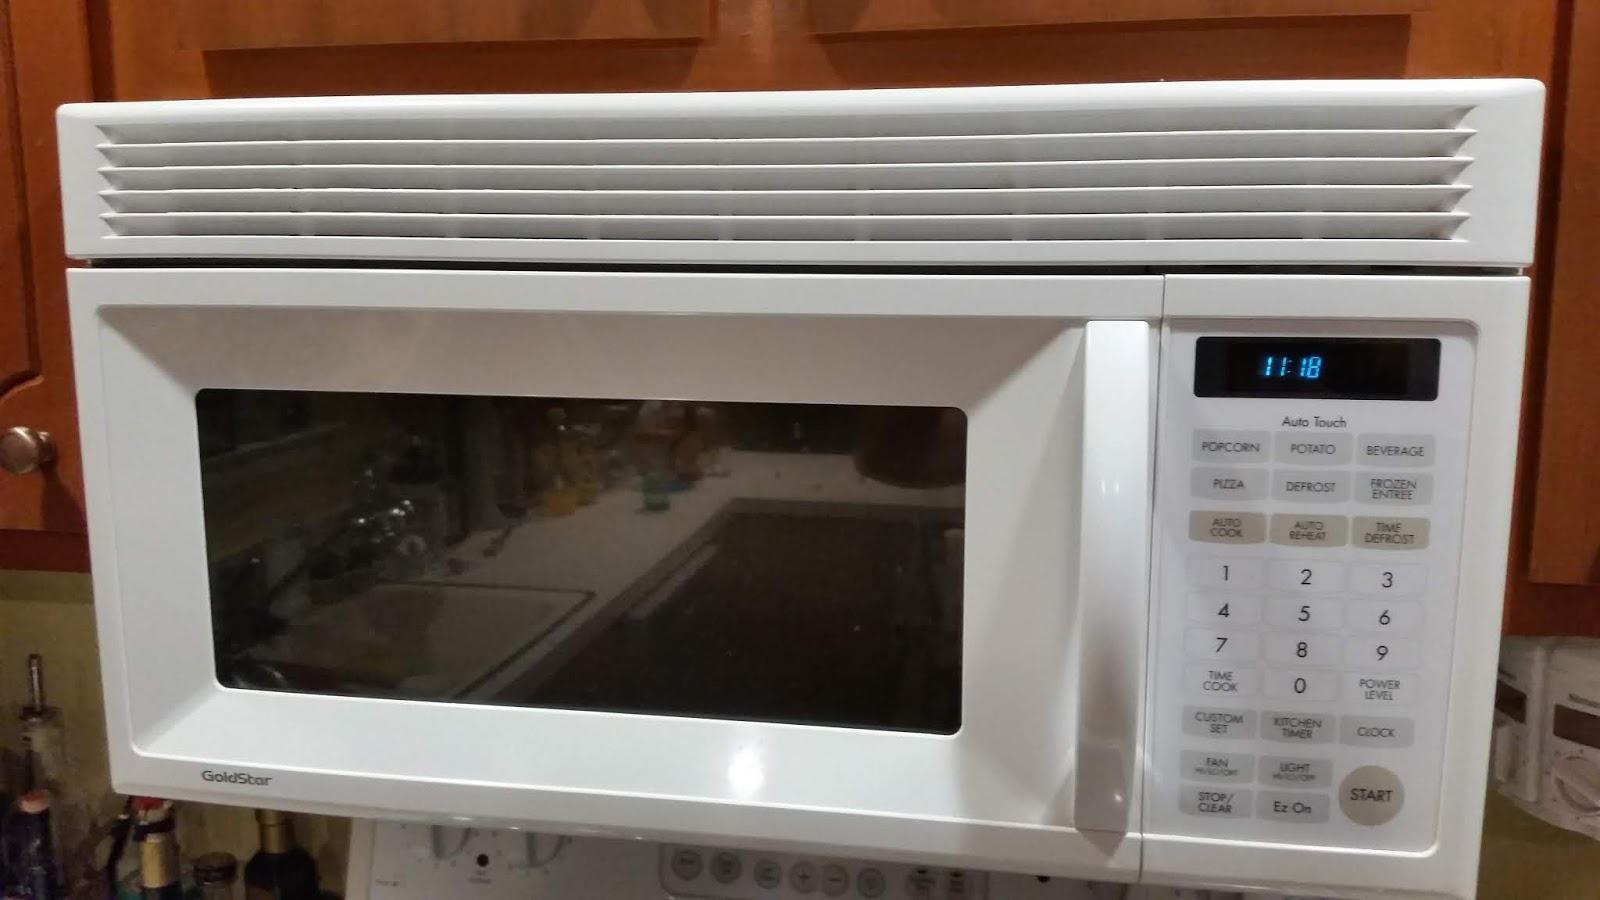 HAnix-diy - Public: Repairing a GoldStar microwave